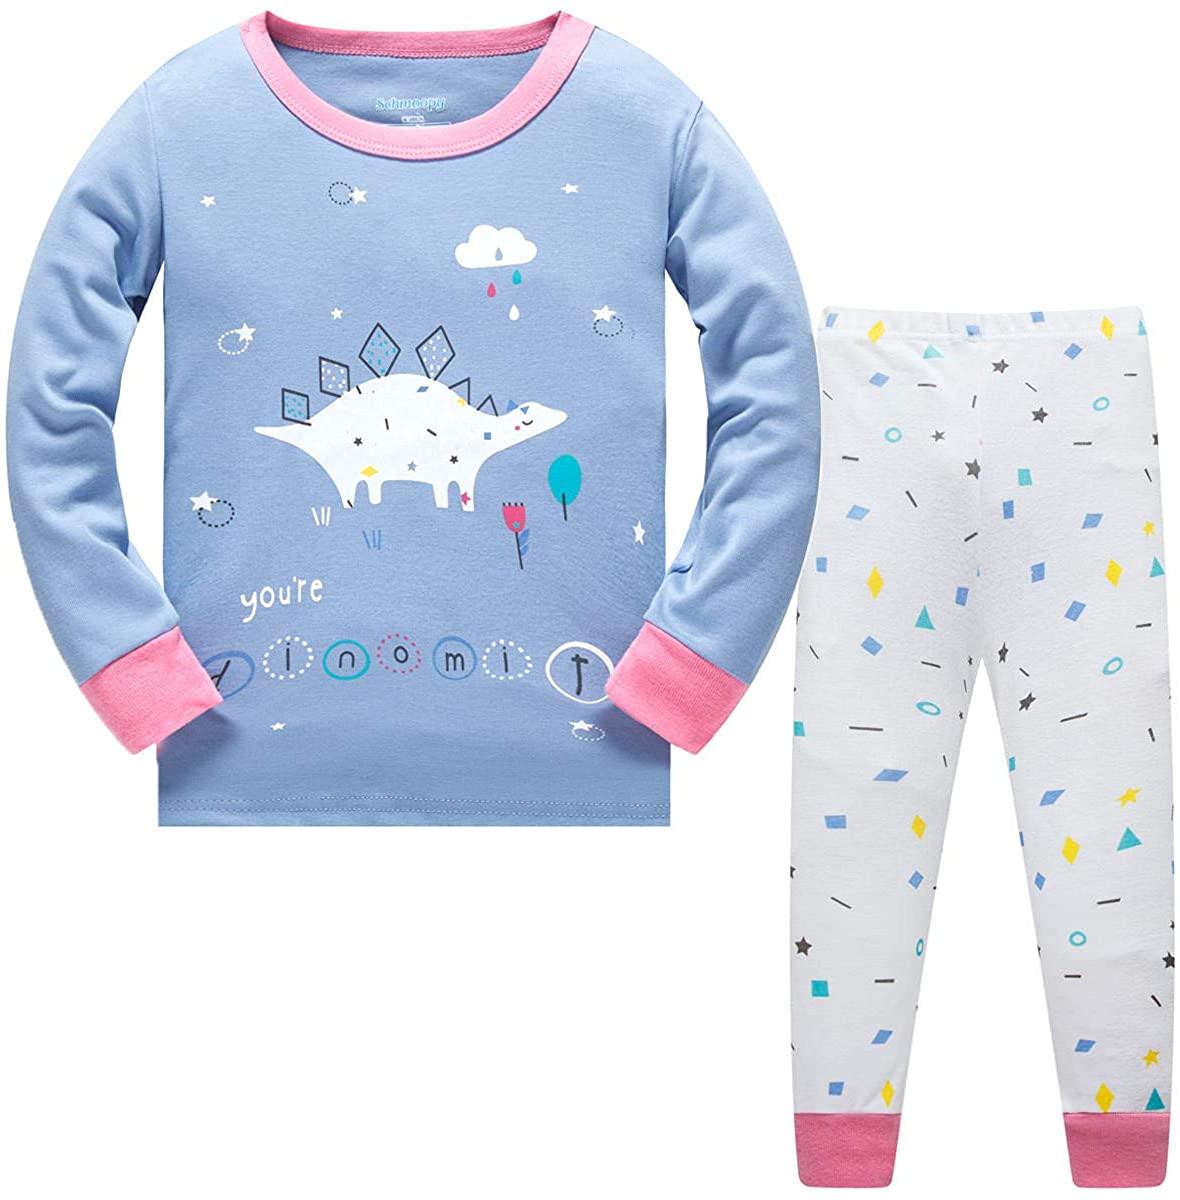 Schmoopy Girls Pajamas Long Sleeve Dinosaur Pjs Set Size 6 Purple